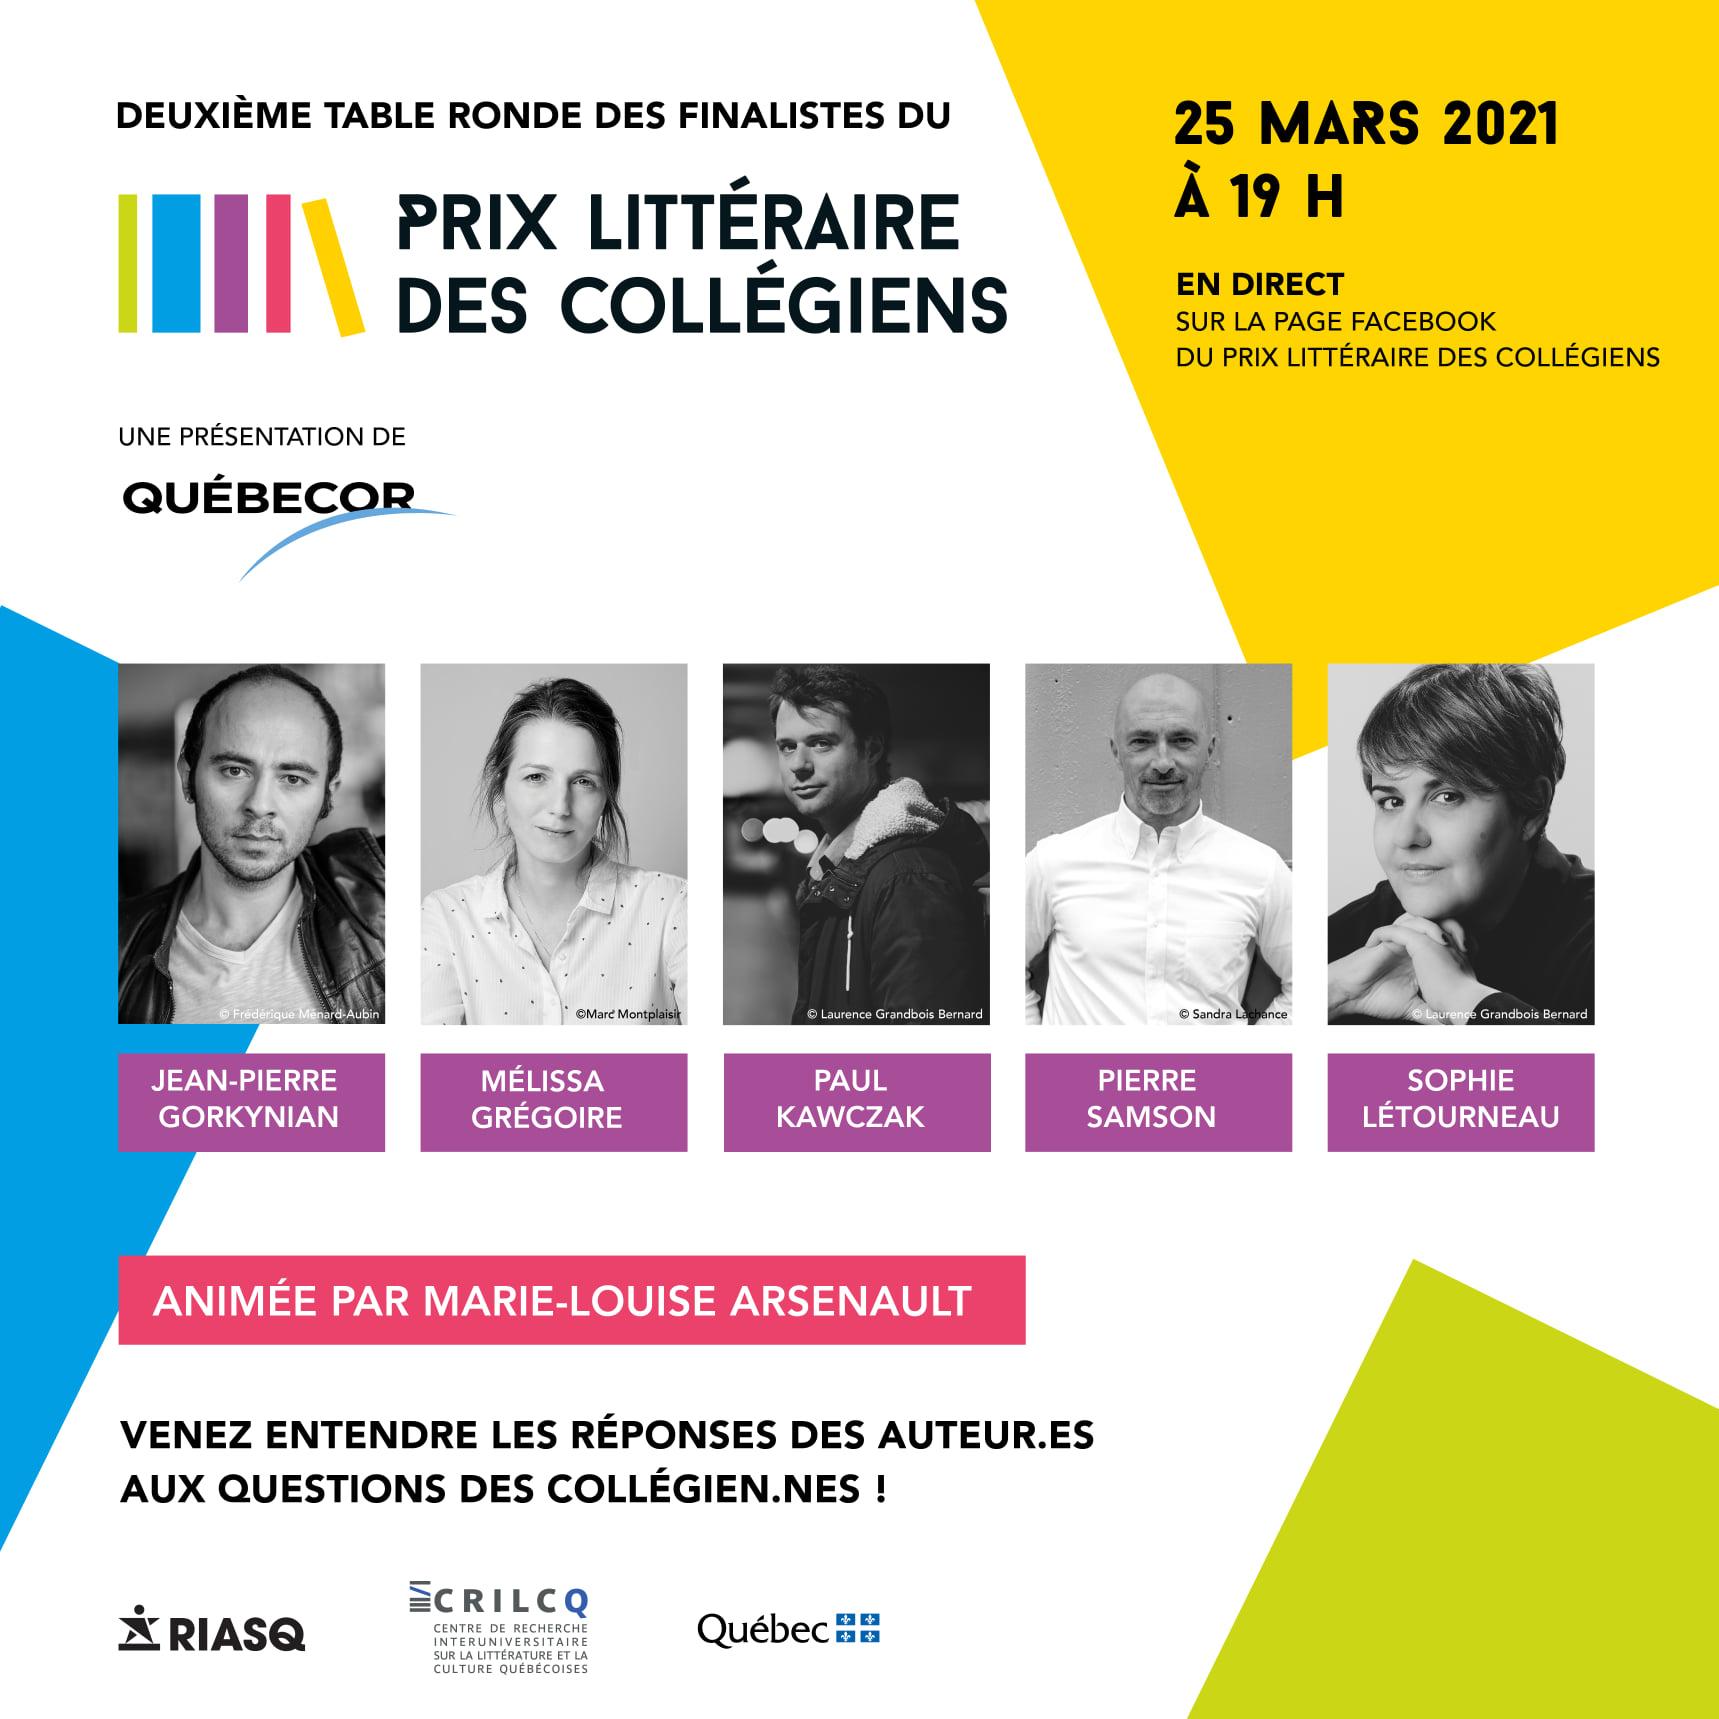 IMAGE-evenement-table-ronde-no2-prix-litteraire-collegiens-2021